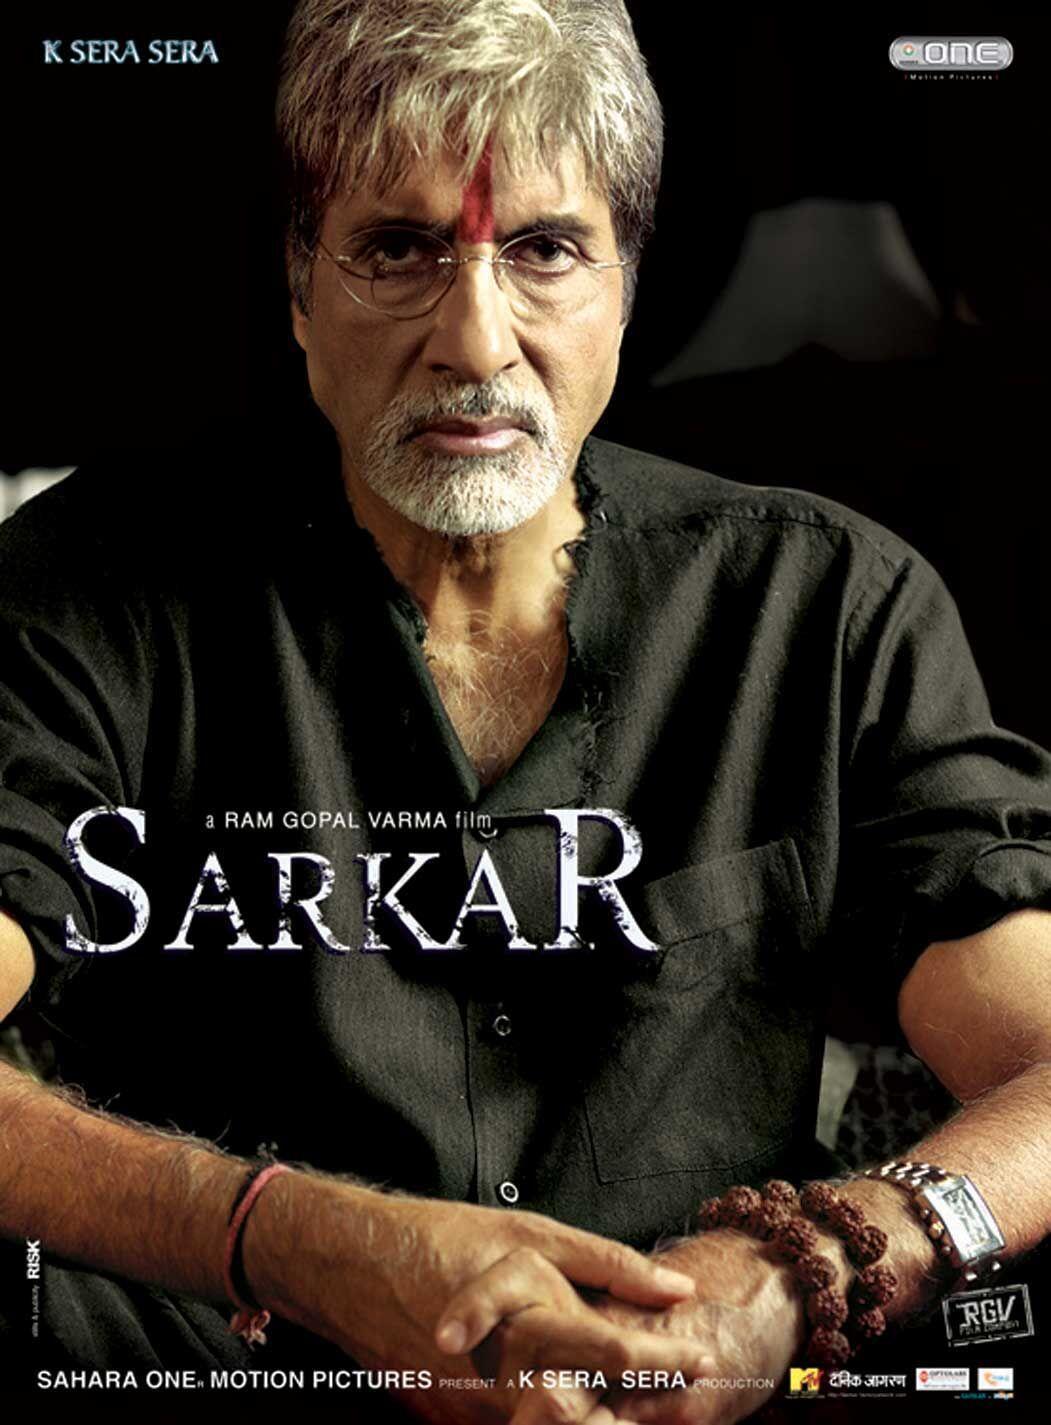 5 Film Ini Buktikan KompaknyaAmitabh Bachchan dan Abhishek Bachchan